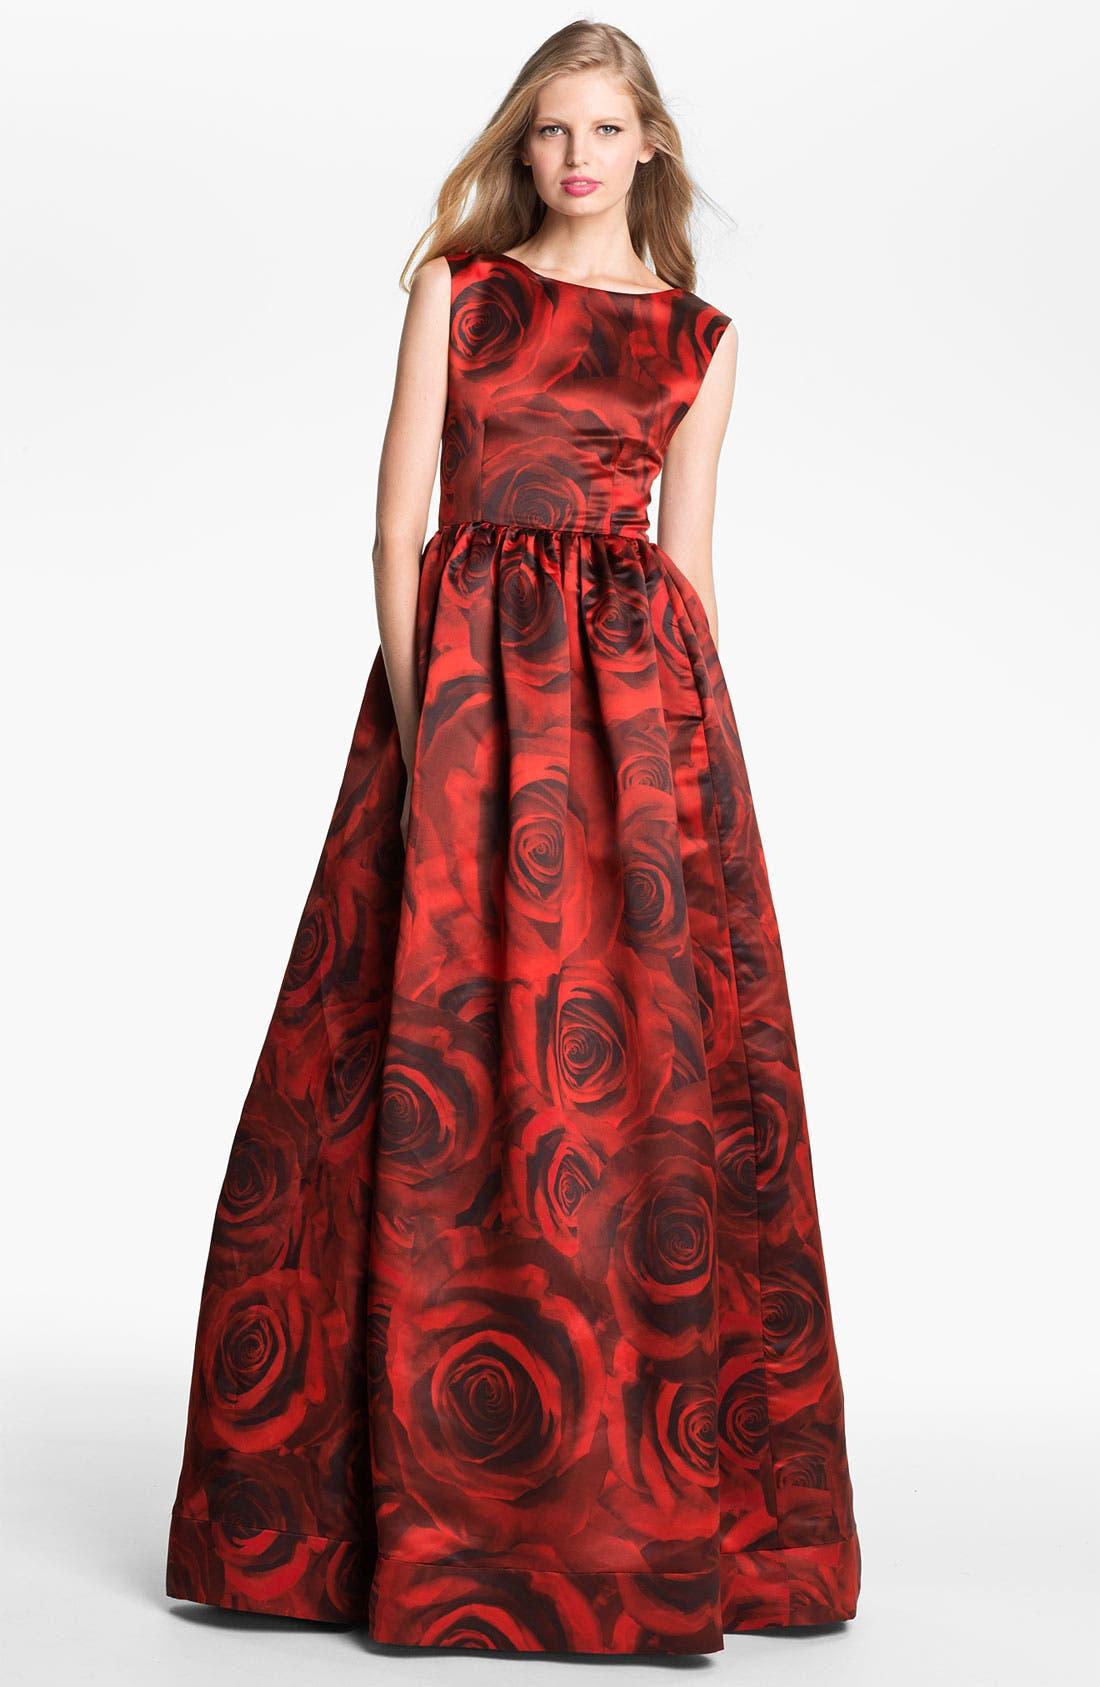 Main Image - Alice + Olivia 'Lano' Rose Print Ballgown